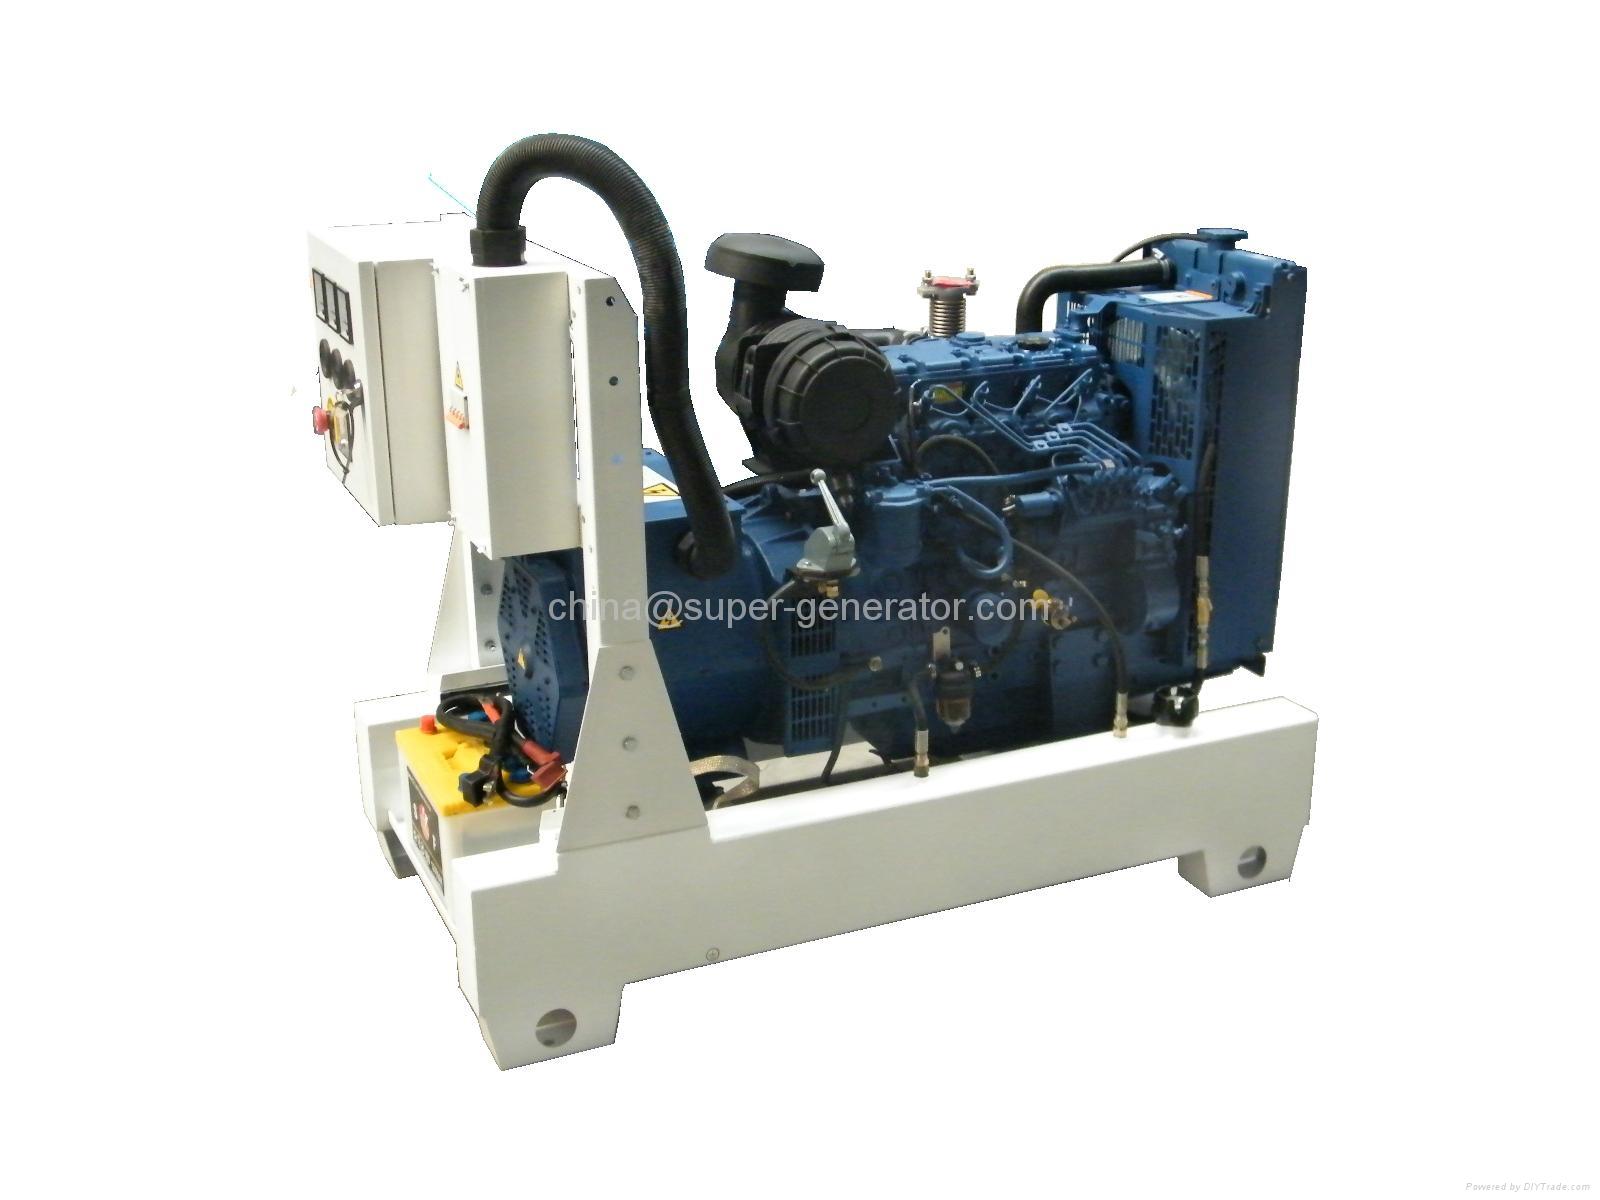 Kubota sel generator 6kw 8kva 7kw 8 8kva D1105 BG with Stamford